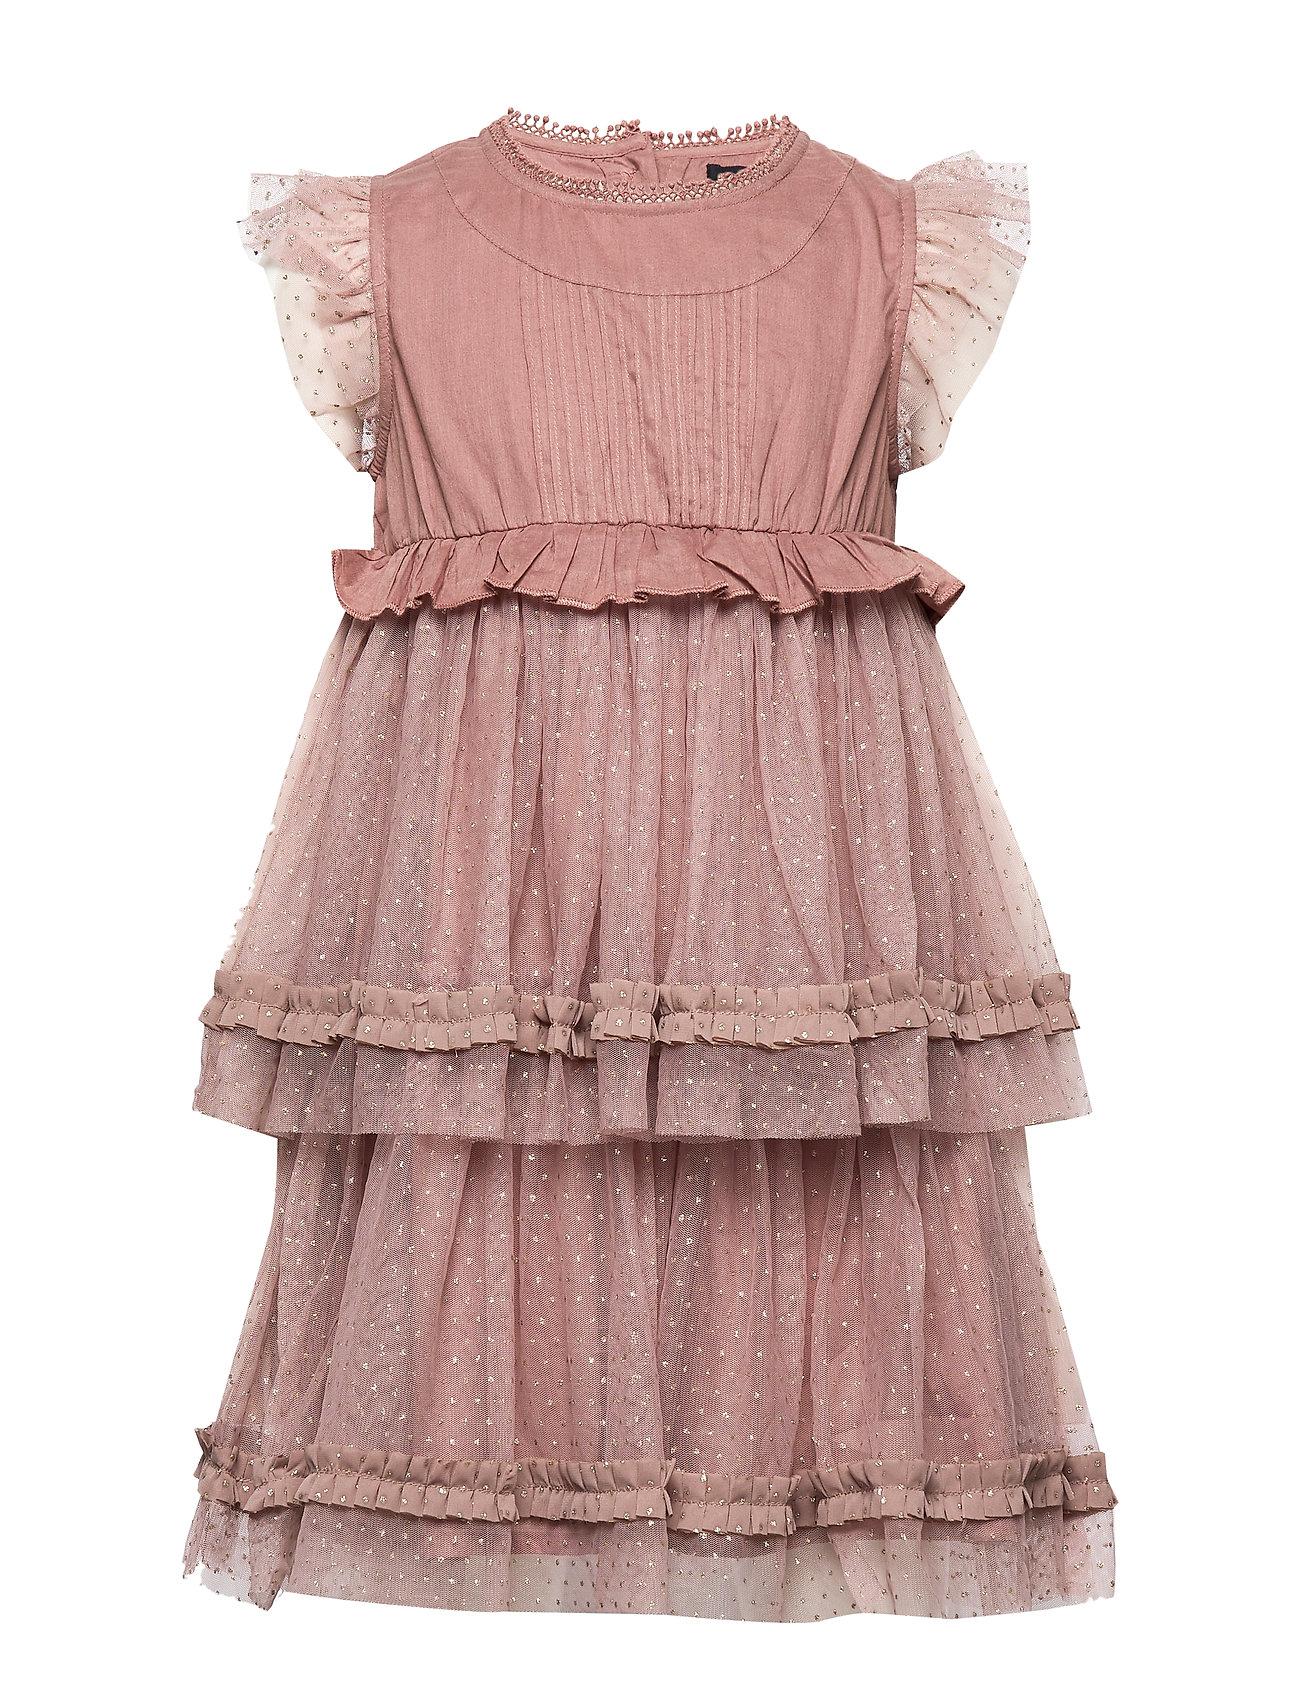 Mini A Ture Darya Dress, K - MUTED LILAC